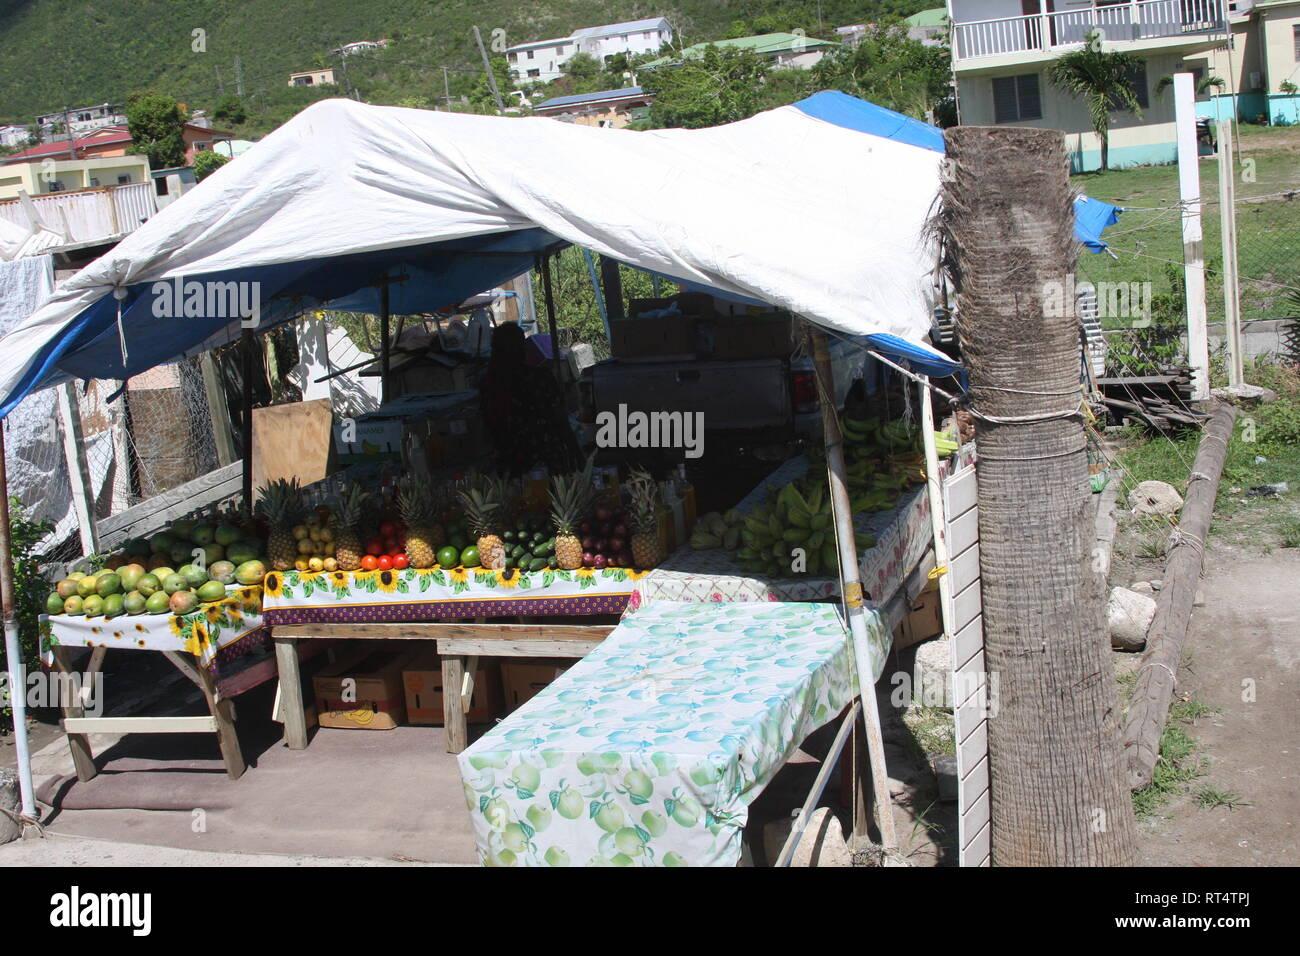 St Marten Fruit Stand Stock Photo